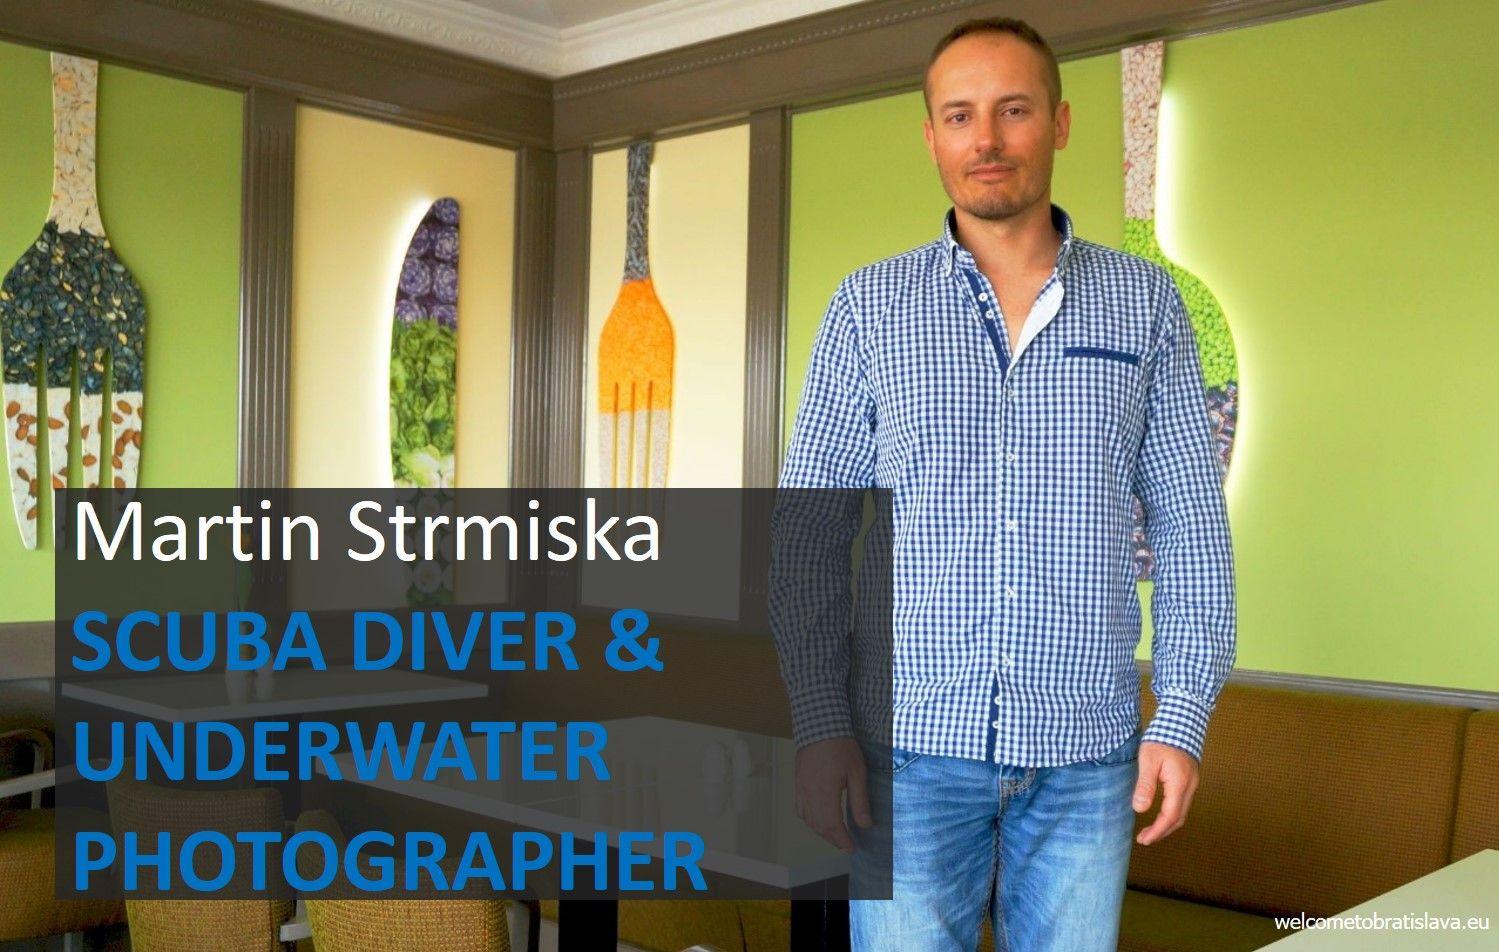 Martin Strmiska_HumansOfBratislava_MainPicture2